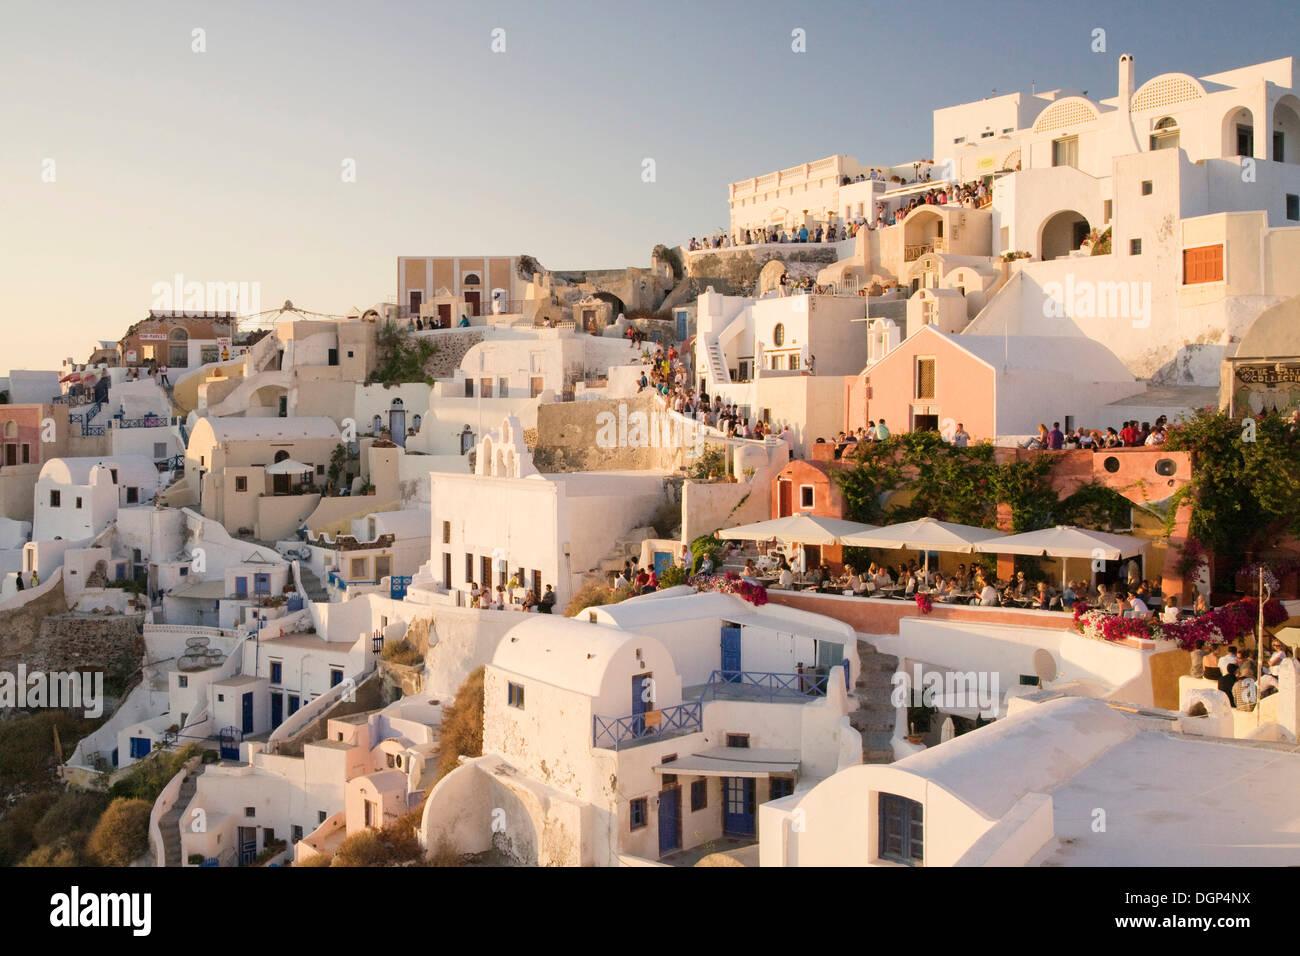 Tourists gathered to watch the sunset, Oia, Santorini, Cyclades, Greece, Europe - Stock Image